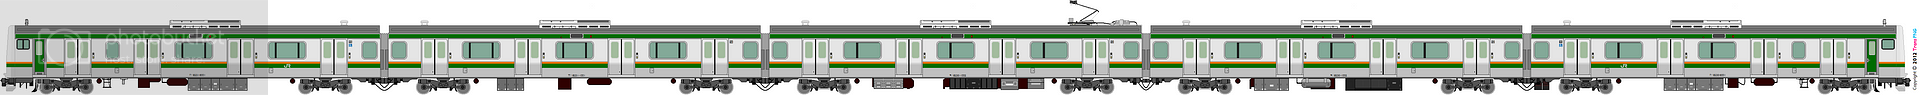 Train 1958